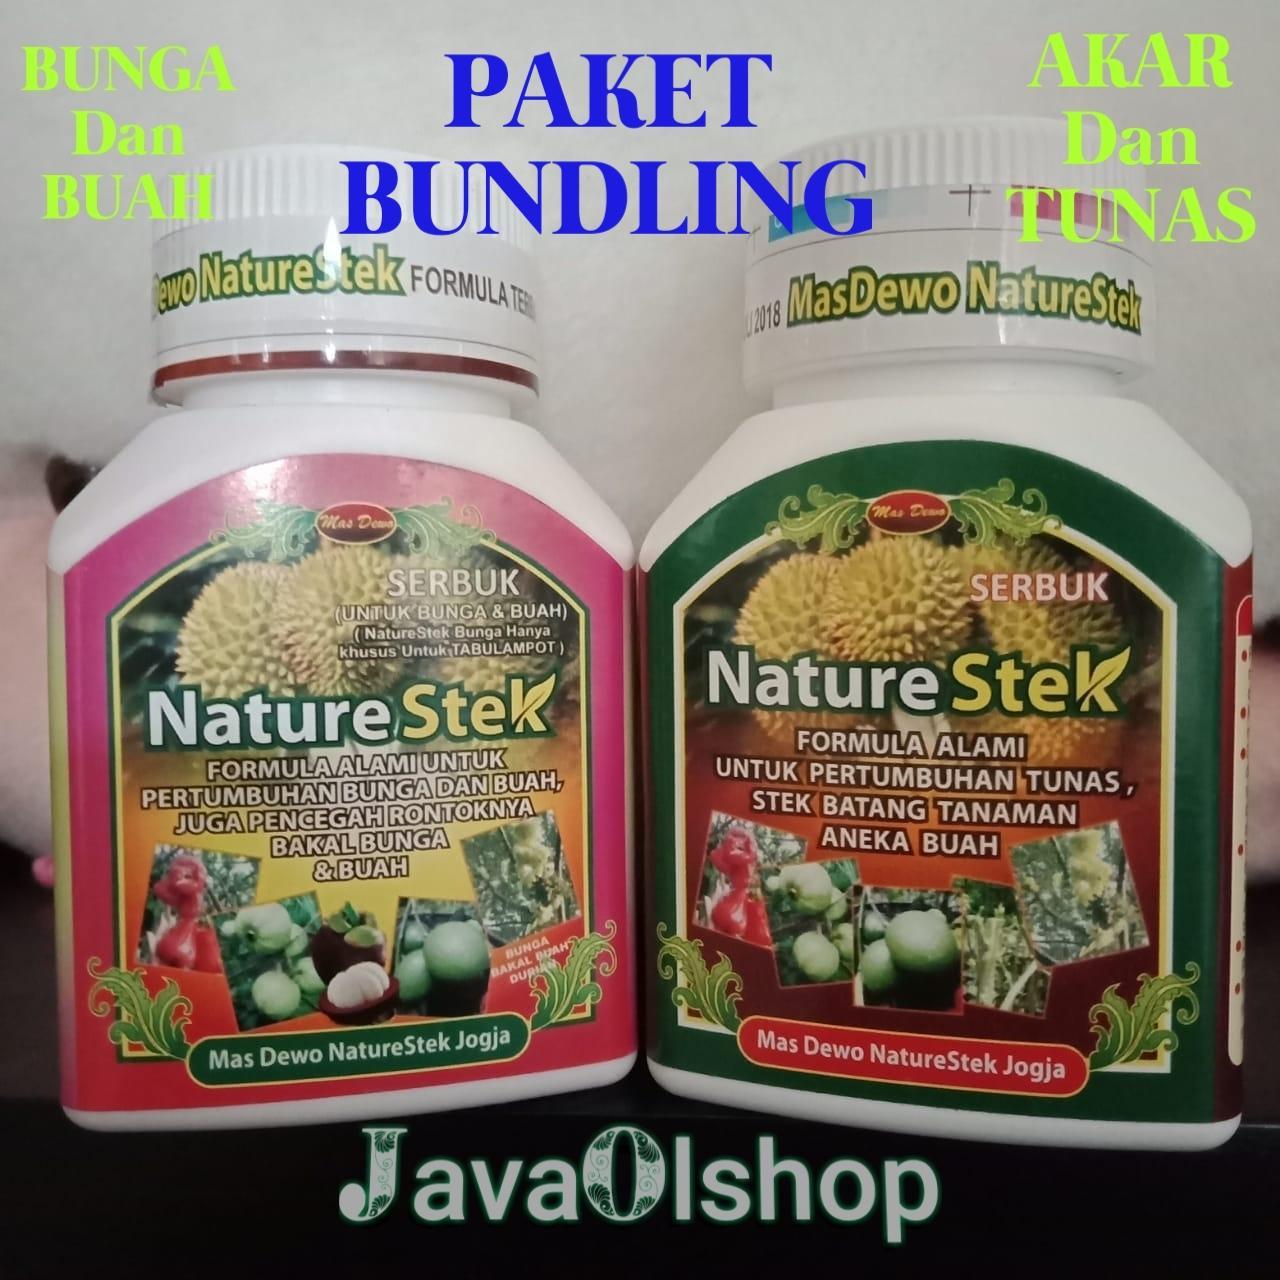 promo 1 botol nature stek bunga buah 1 botol nature stek akar tunas